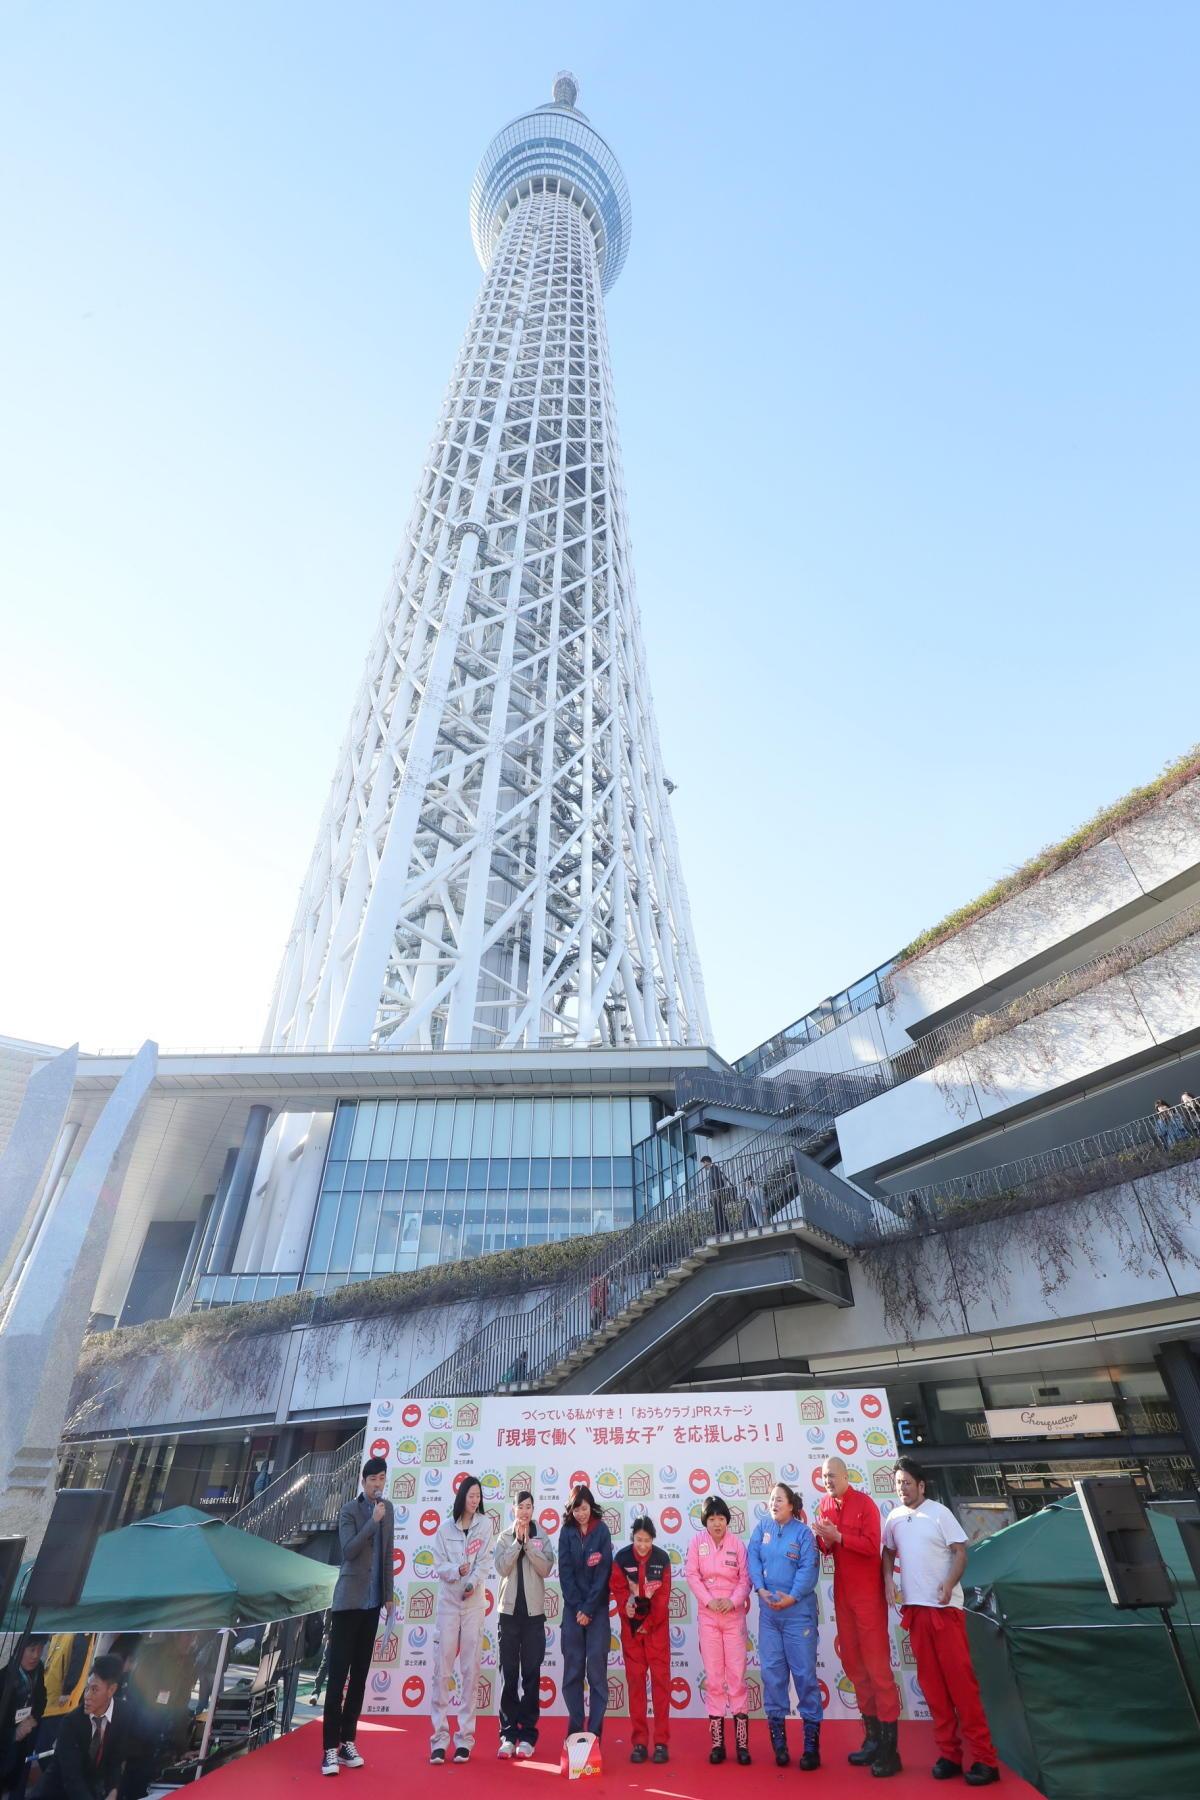 http://news.yoshimoto.co.jp/20170226100715-fb54df525bd602f58cbb4eabdbb2f3392239e6e4.jpg